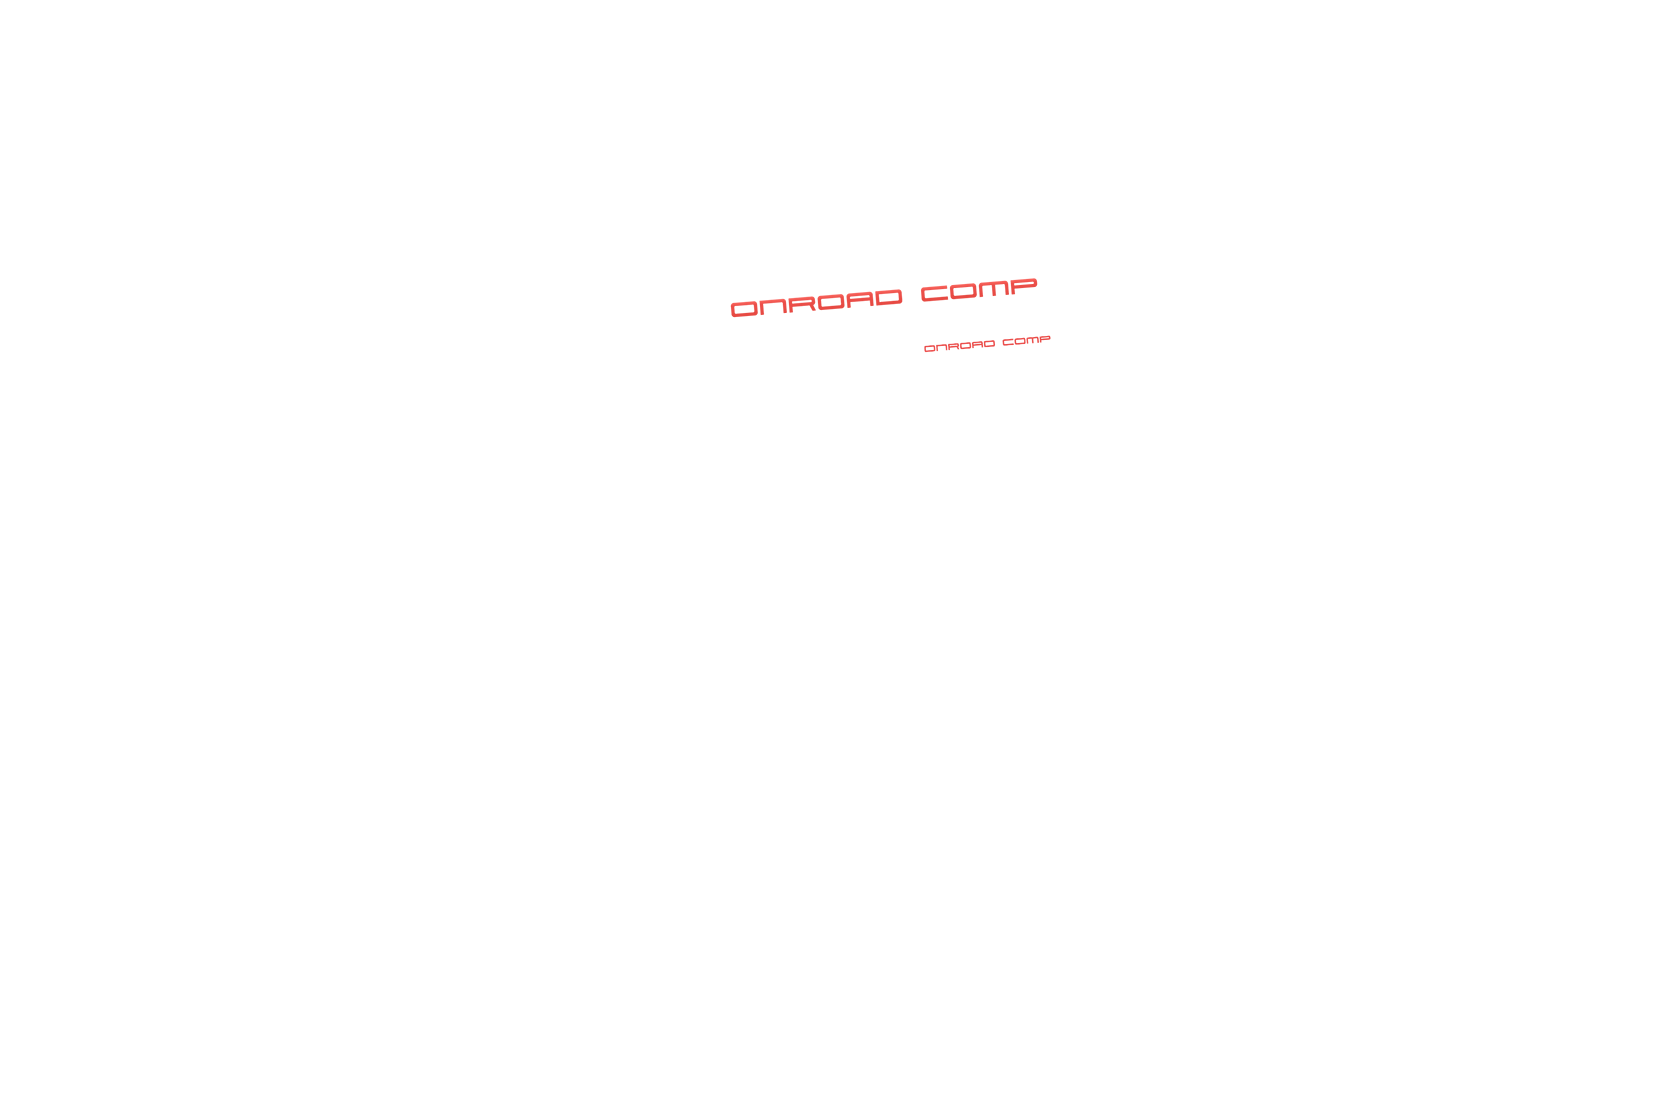 MÜSING - Konfigurator / Onroad-comp